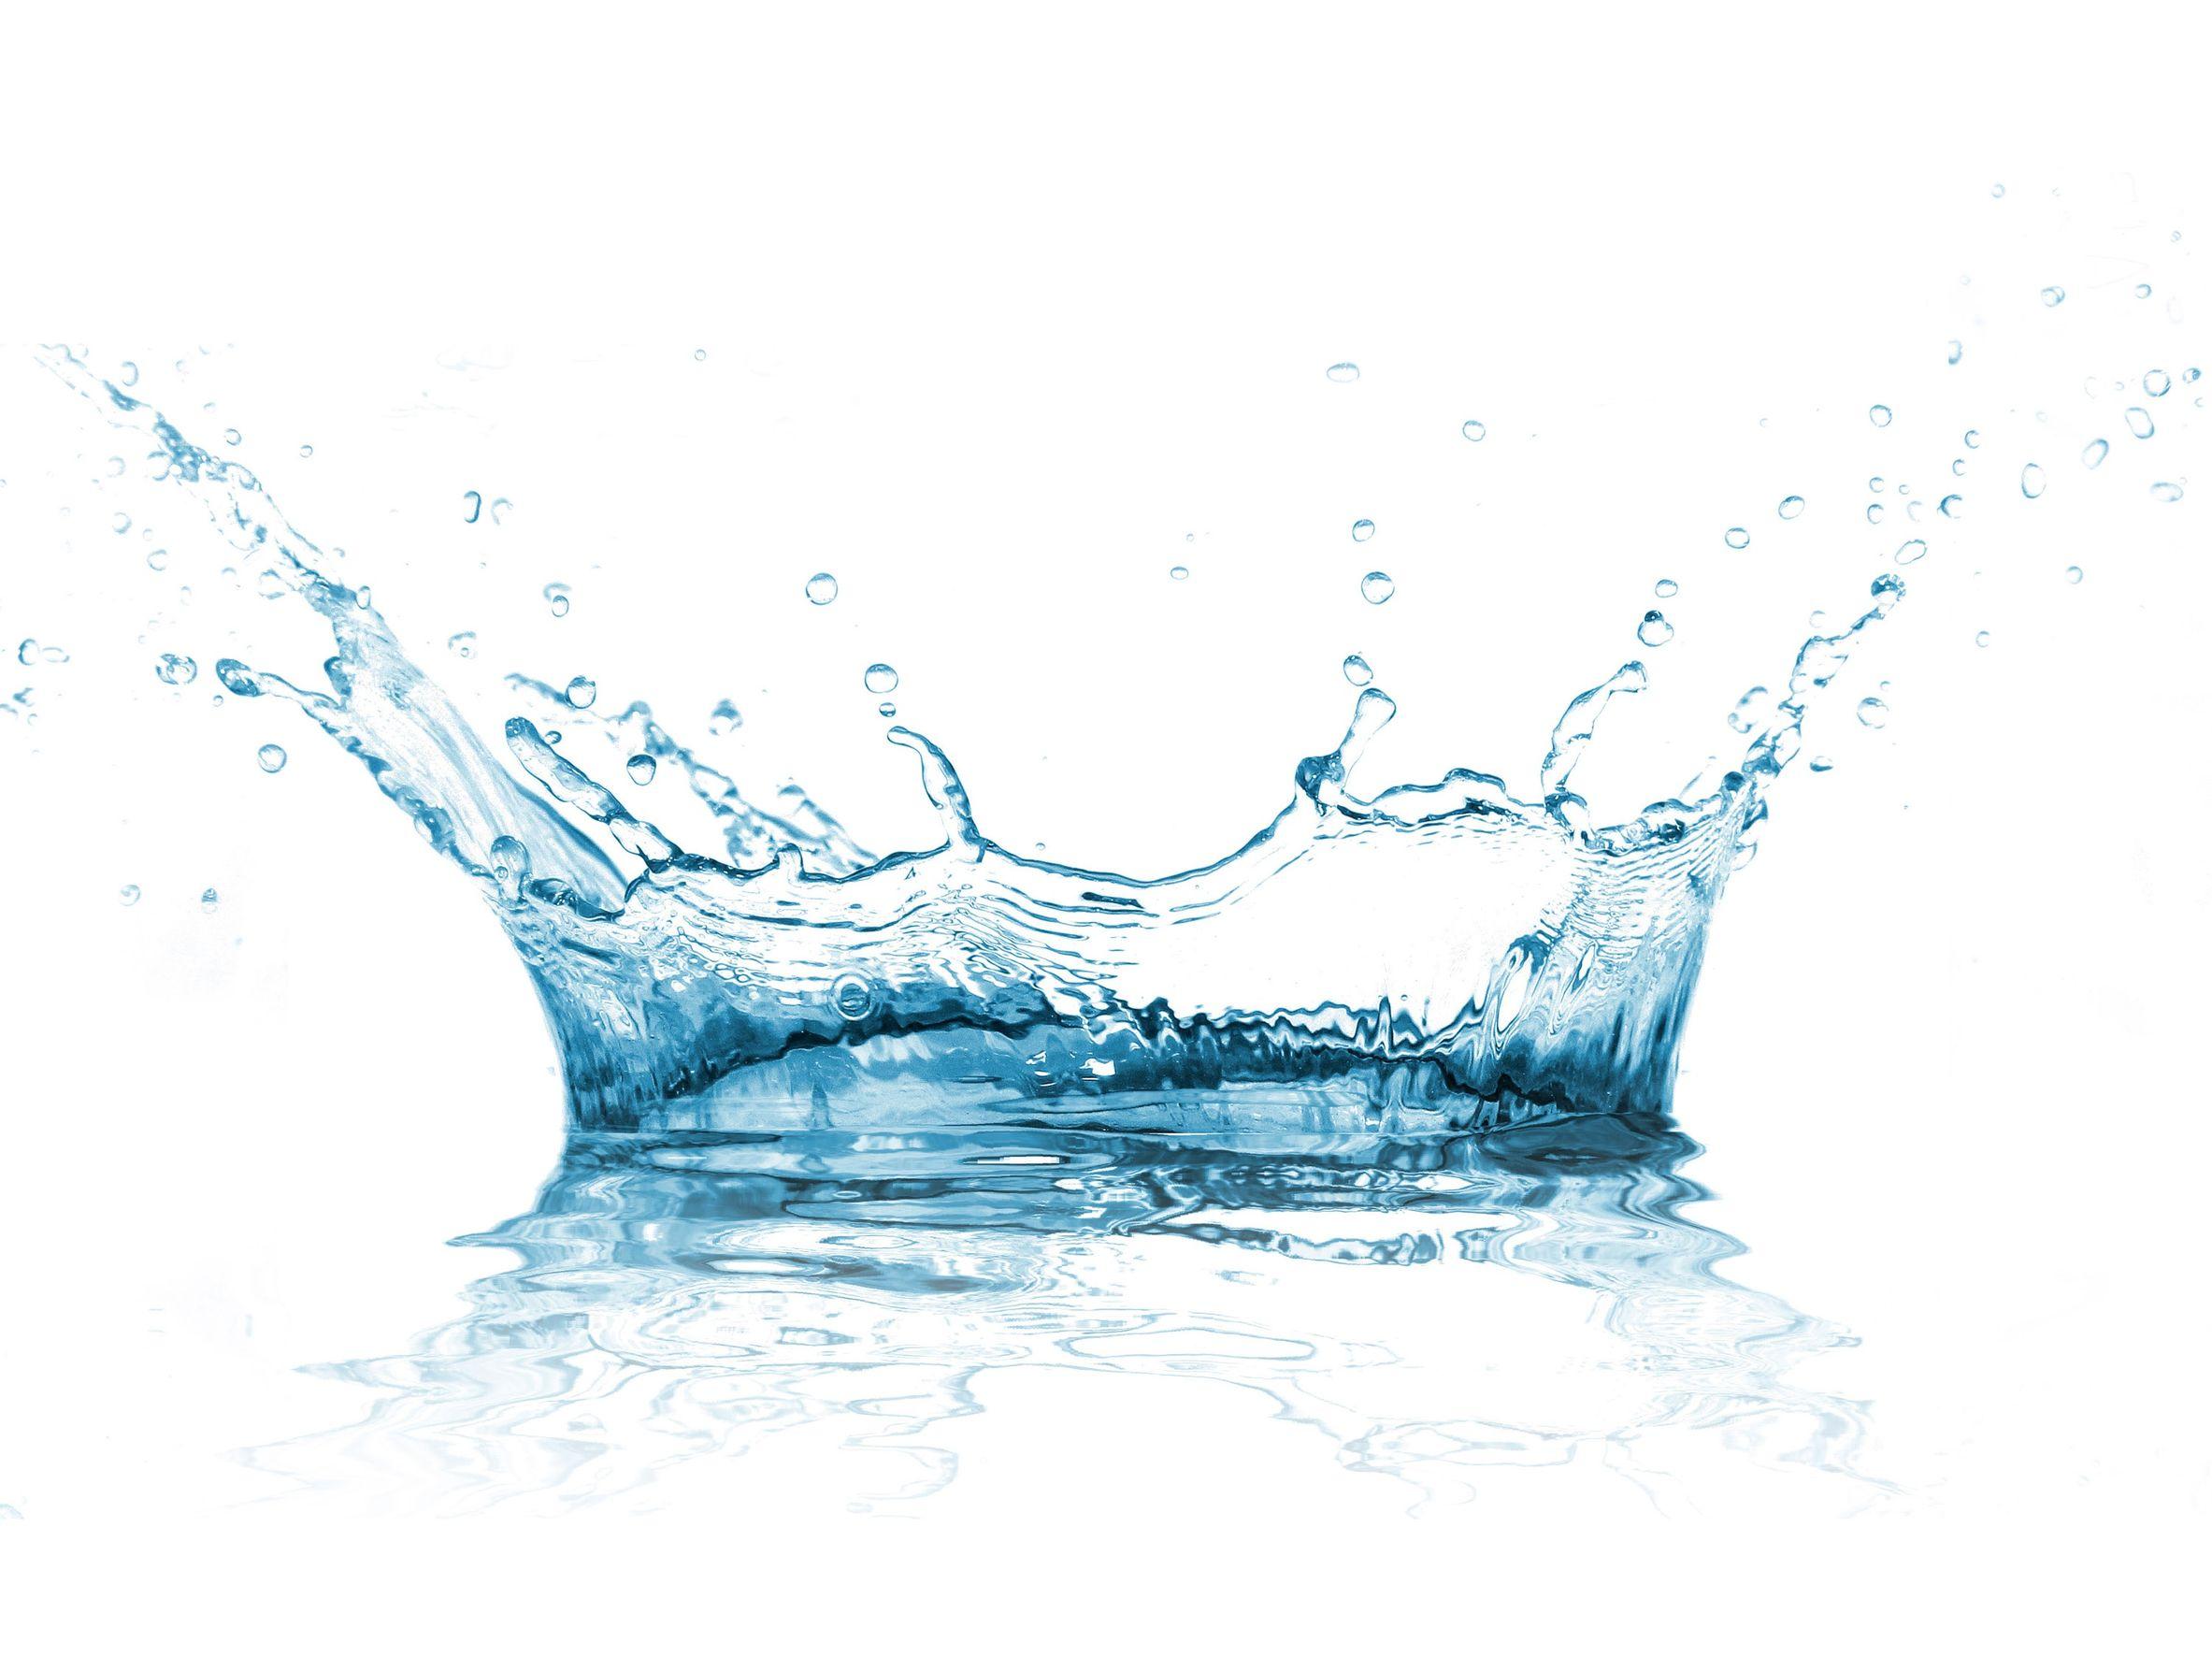 16309060 - water splash over white background